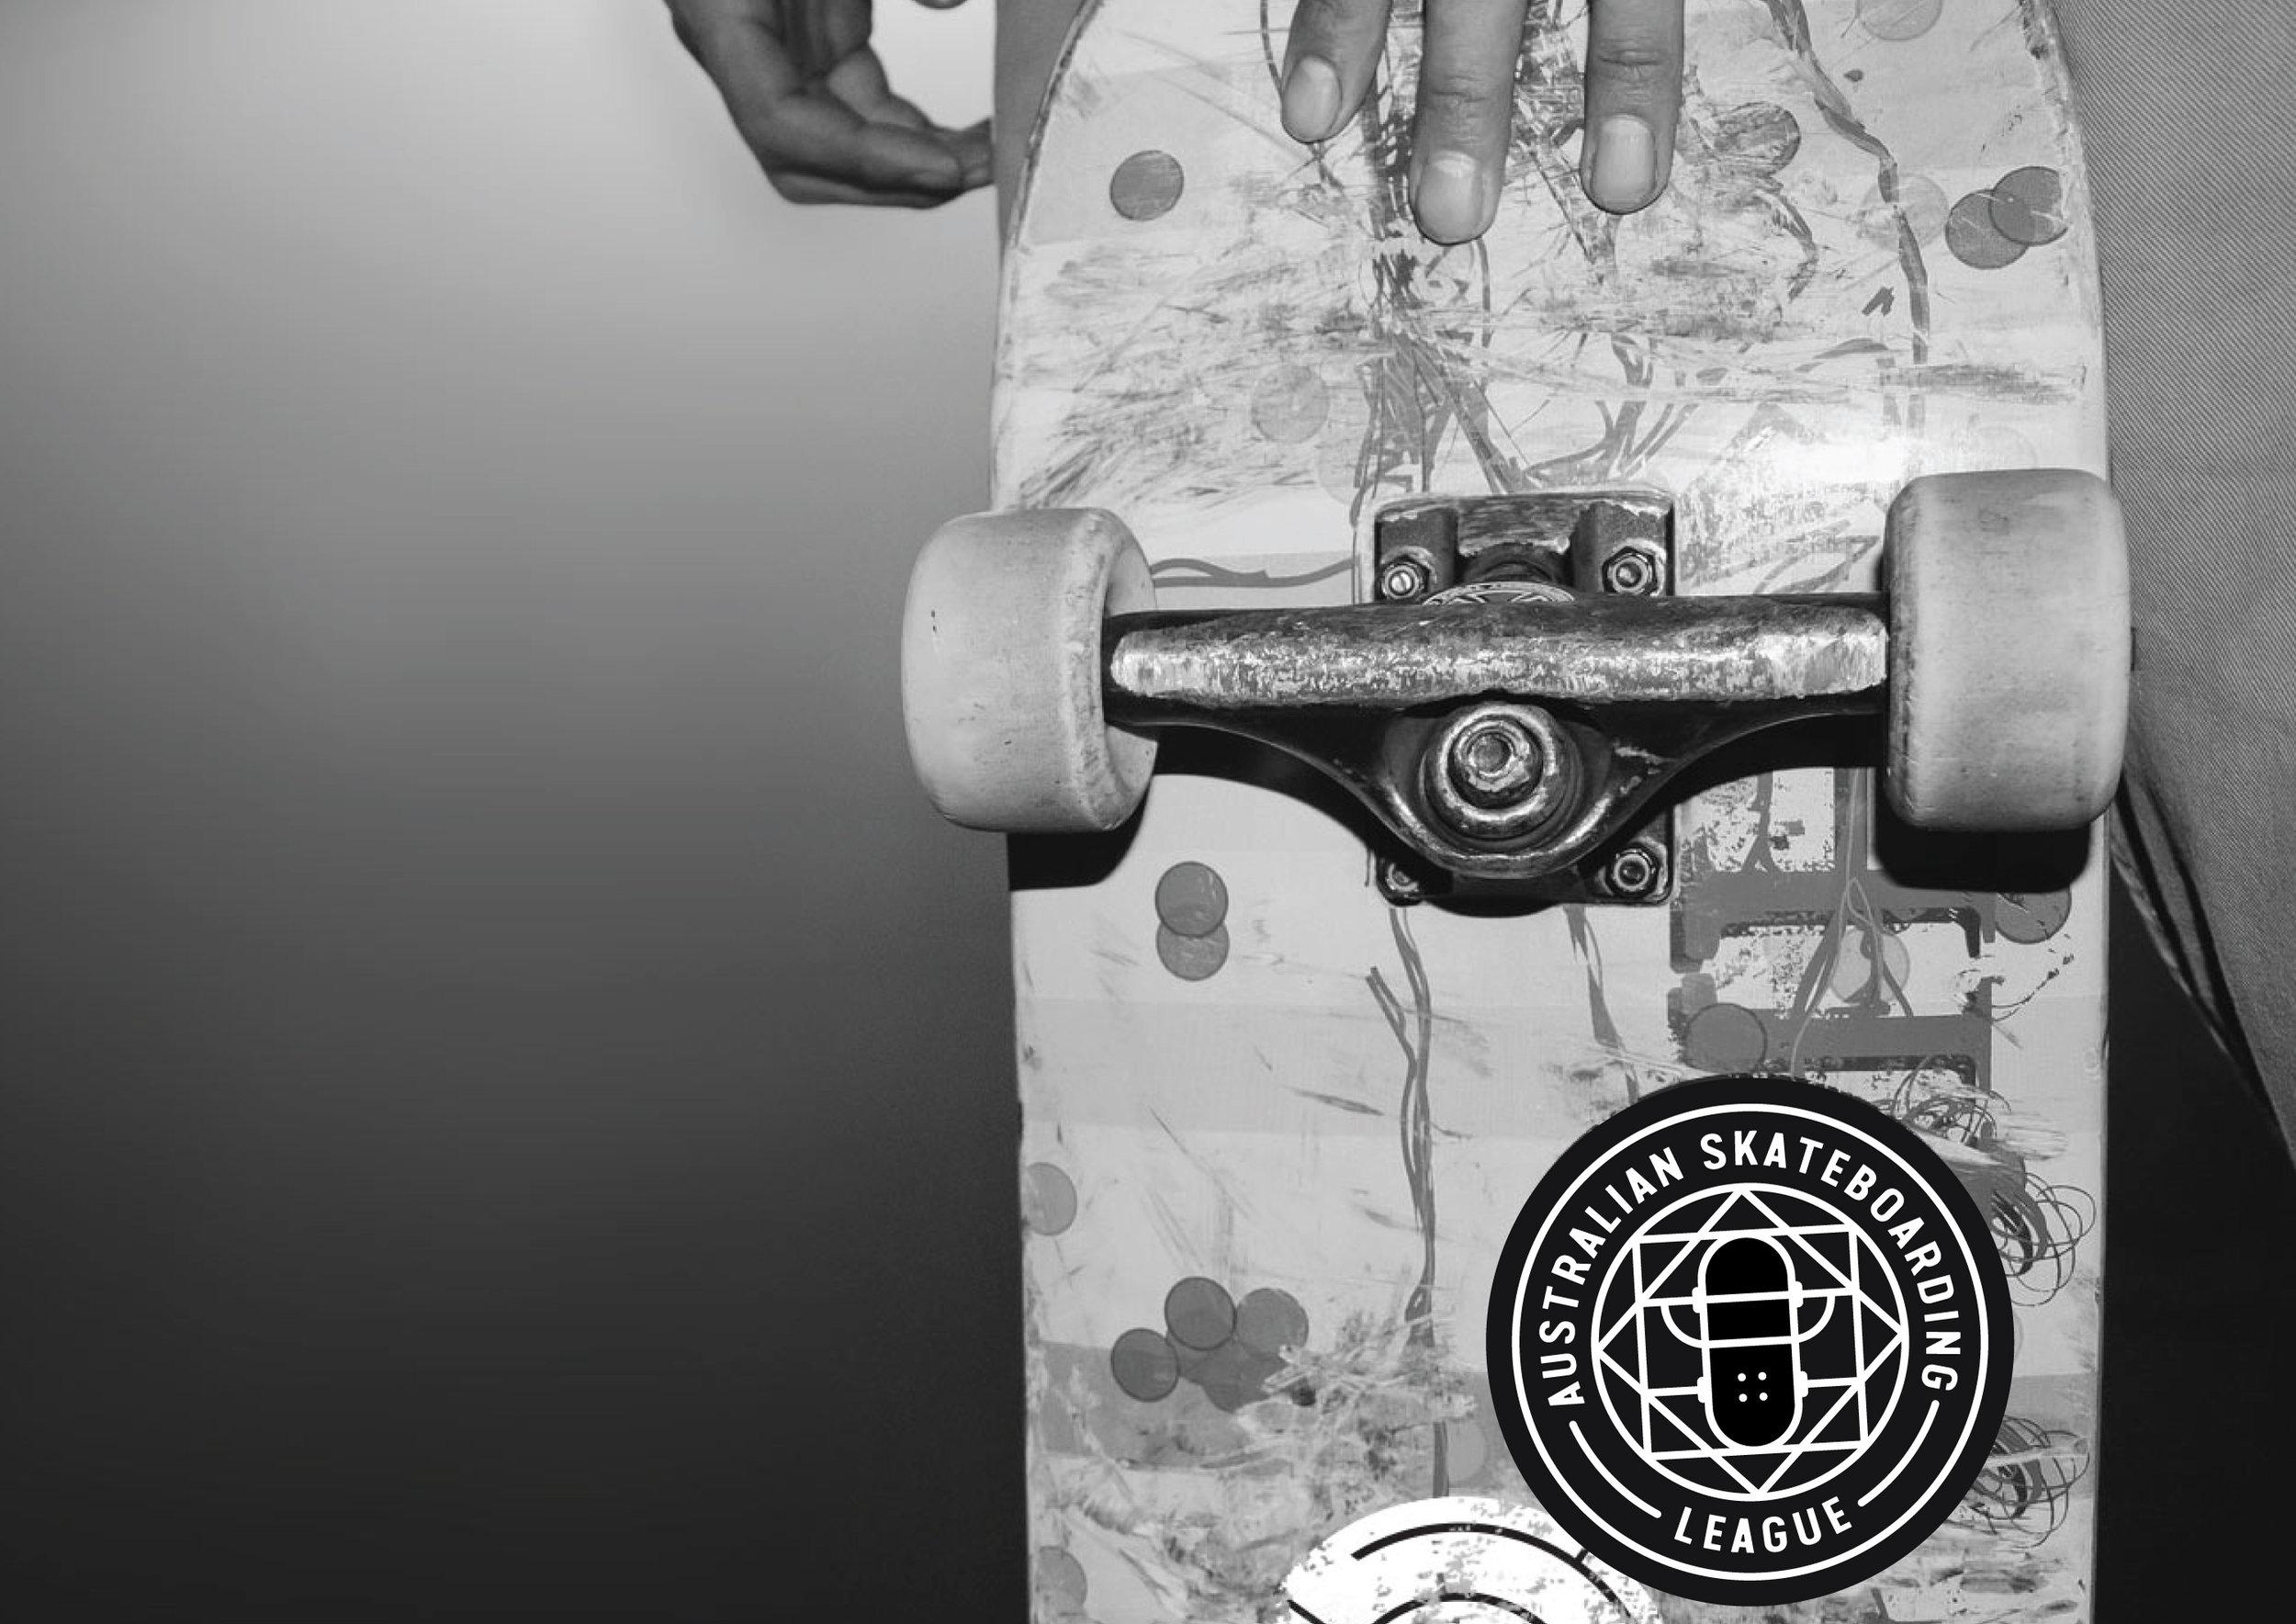 Australian Skateboarding League stickers Graphic design melbourne, branding design melbourne, branding design, packaging design melbourne, design studio melbourne, graphic design